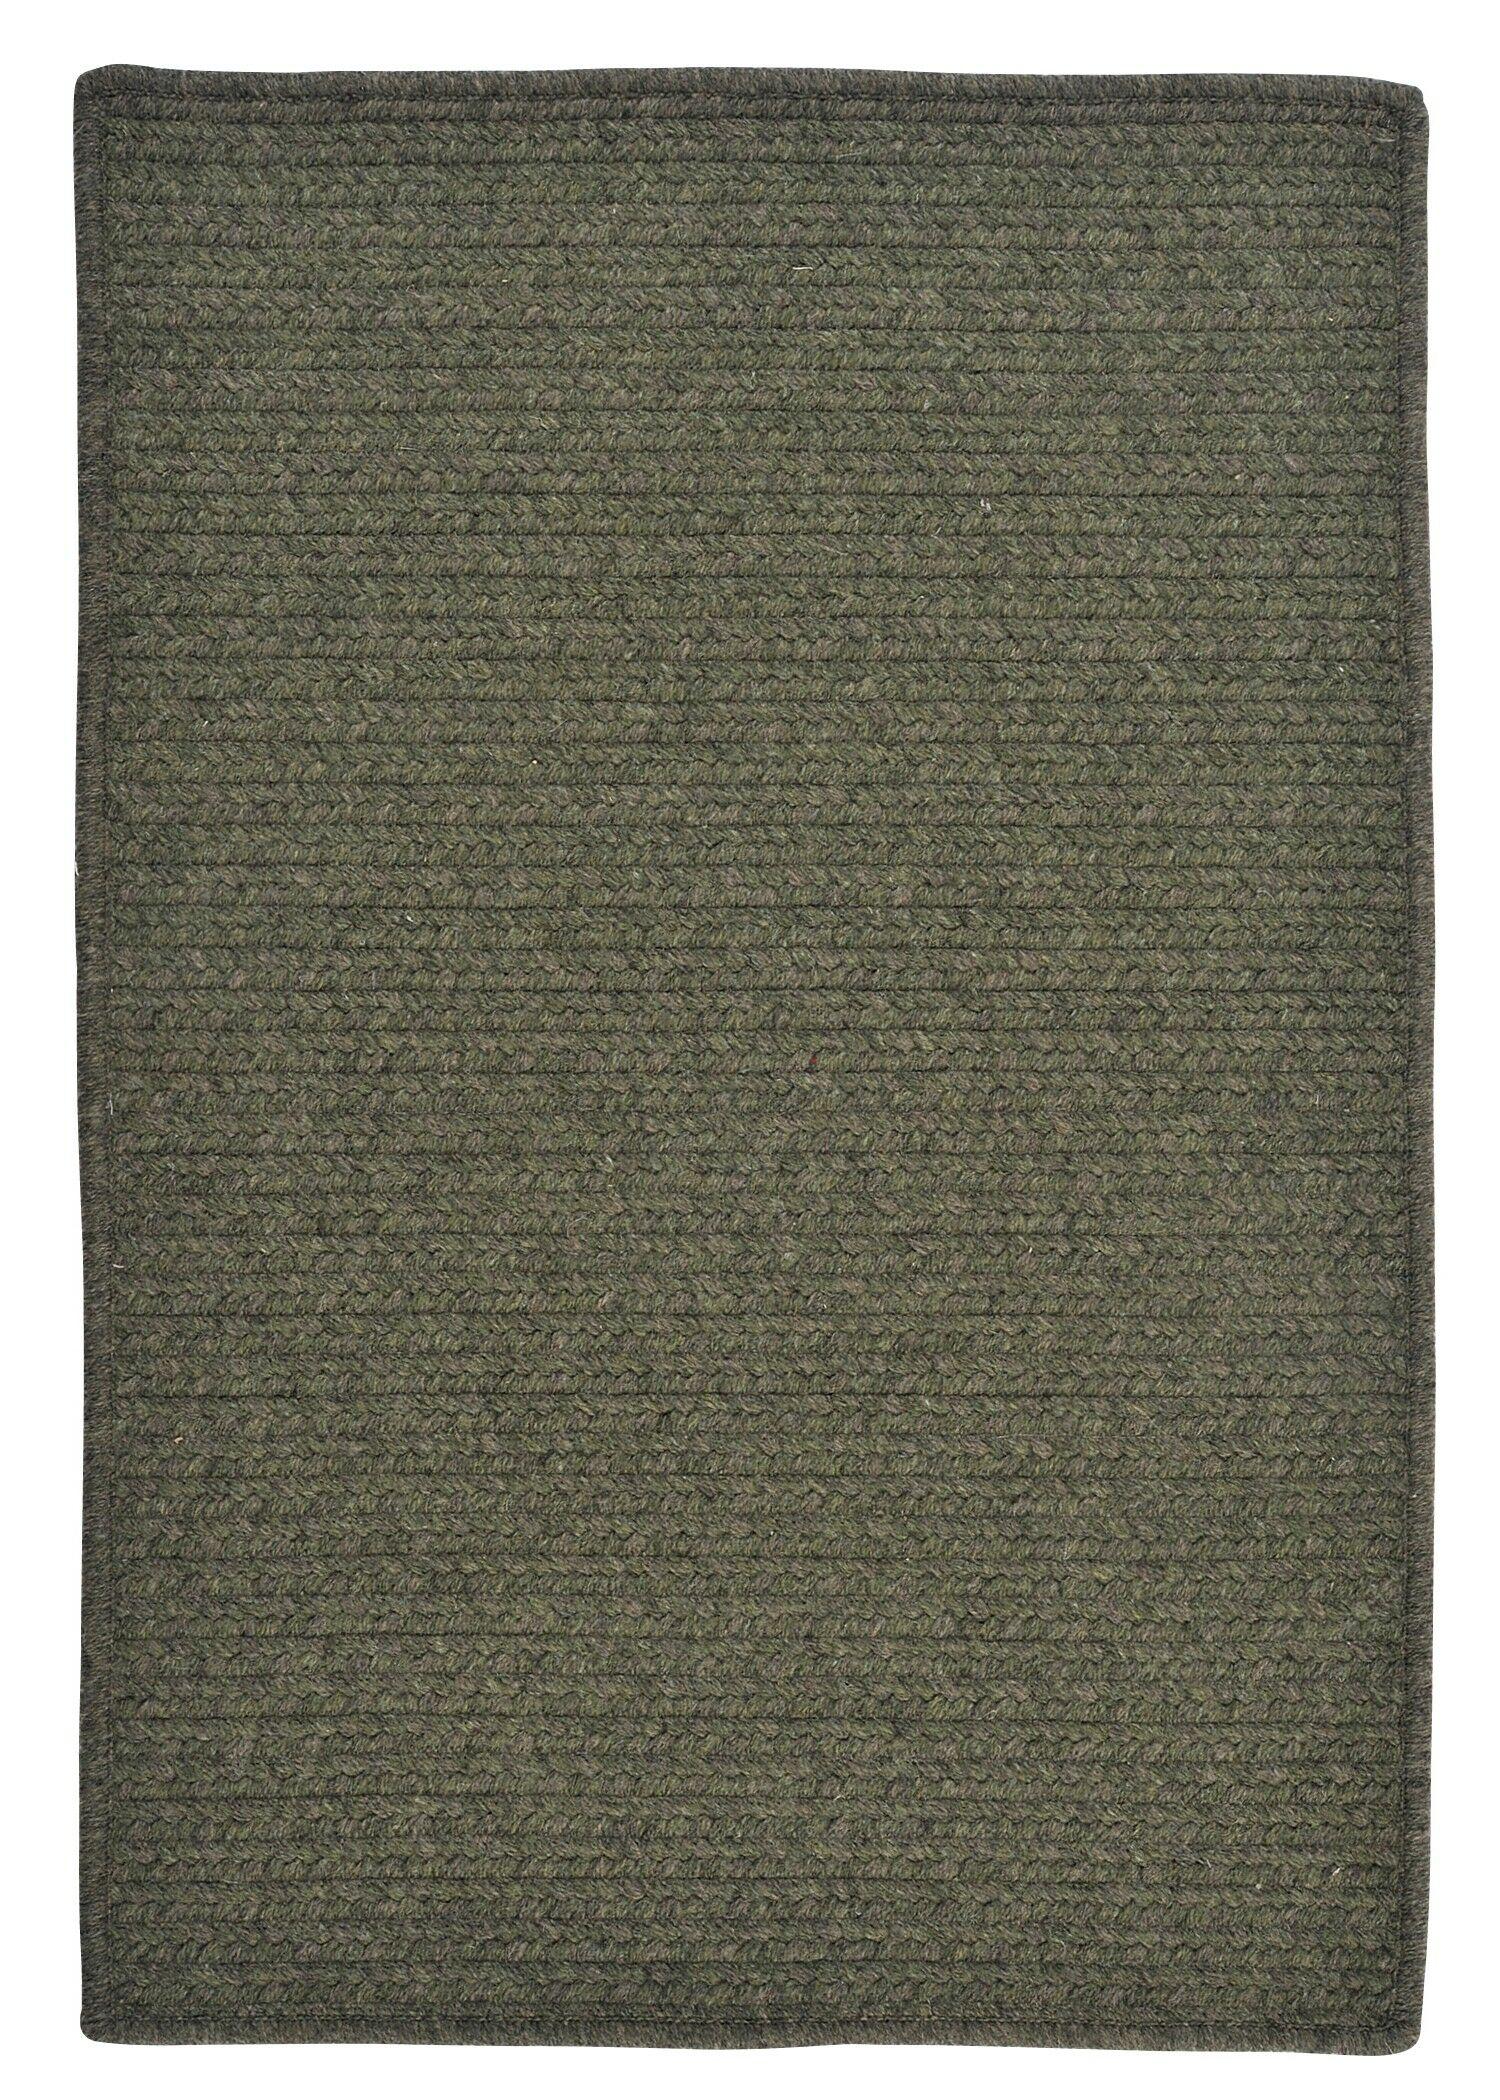 Courtyard Olive Rug Rug Size: Runner 2' x 12'